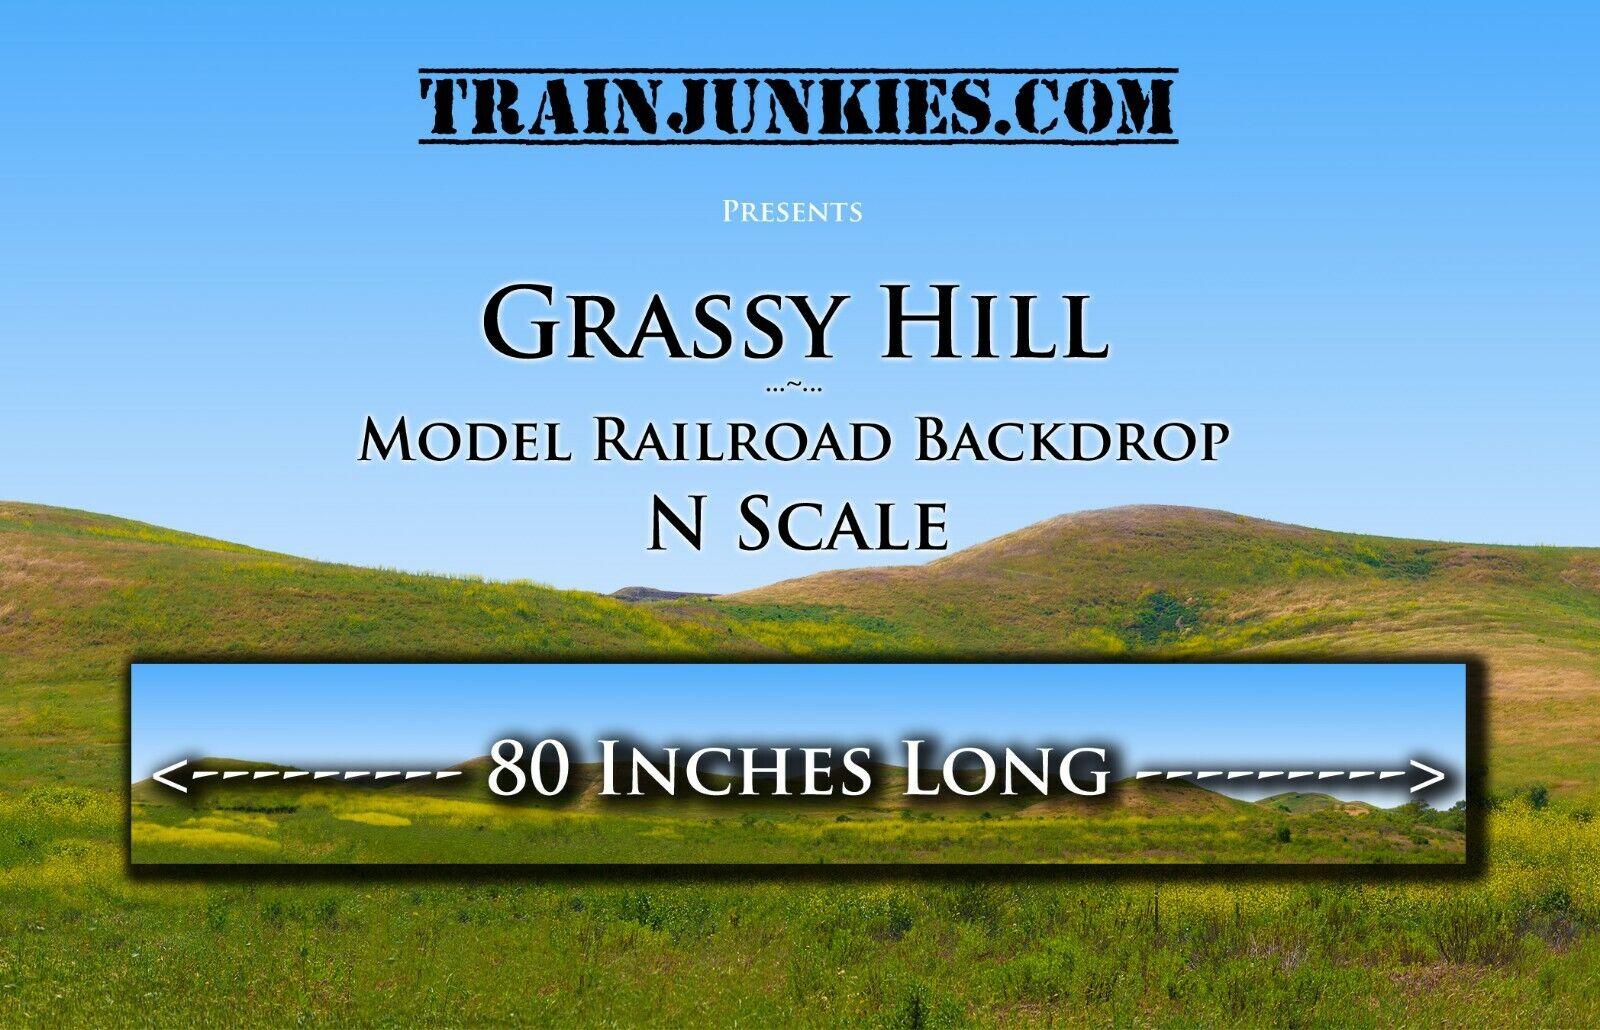 Train Junkies N Scale Grassy Hill modellolo Railstrada Backdrop 12x80